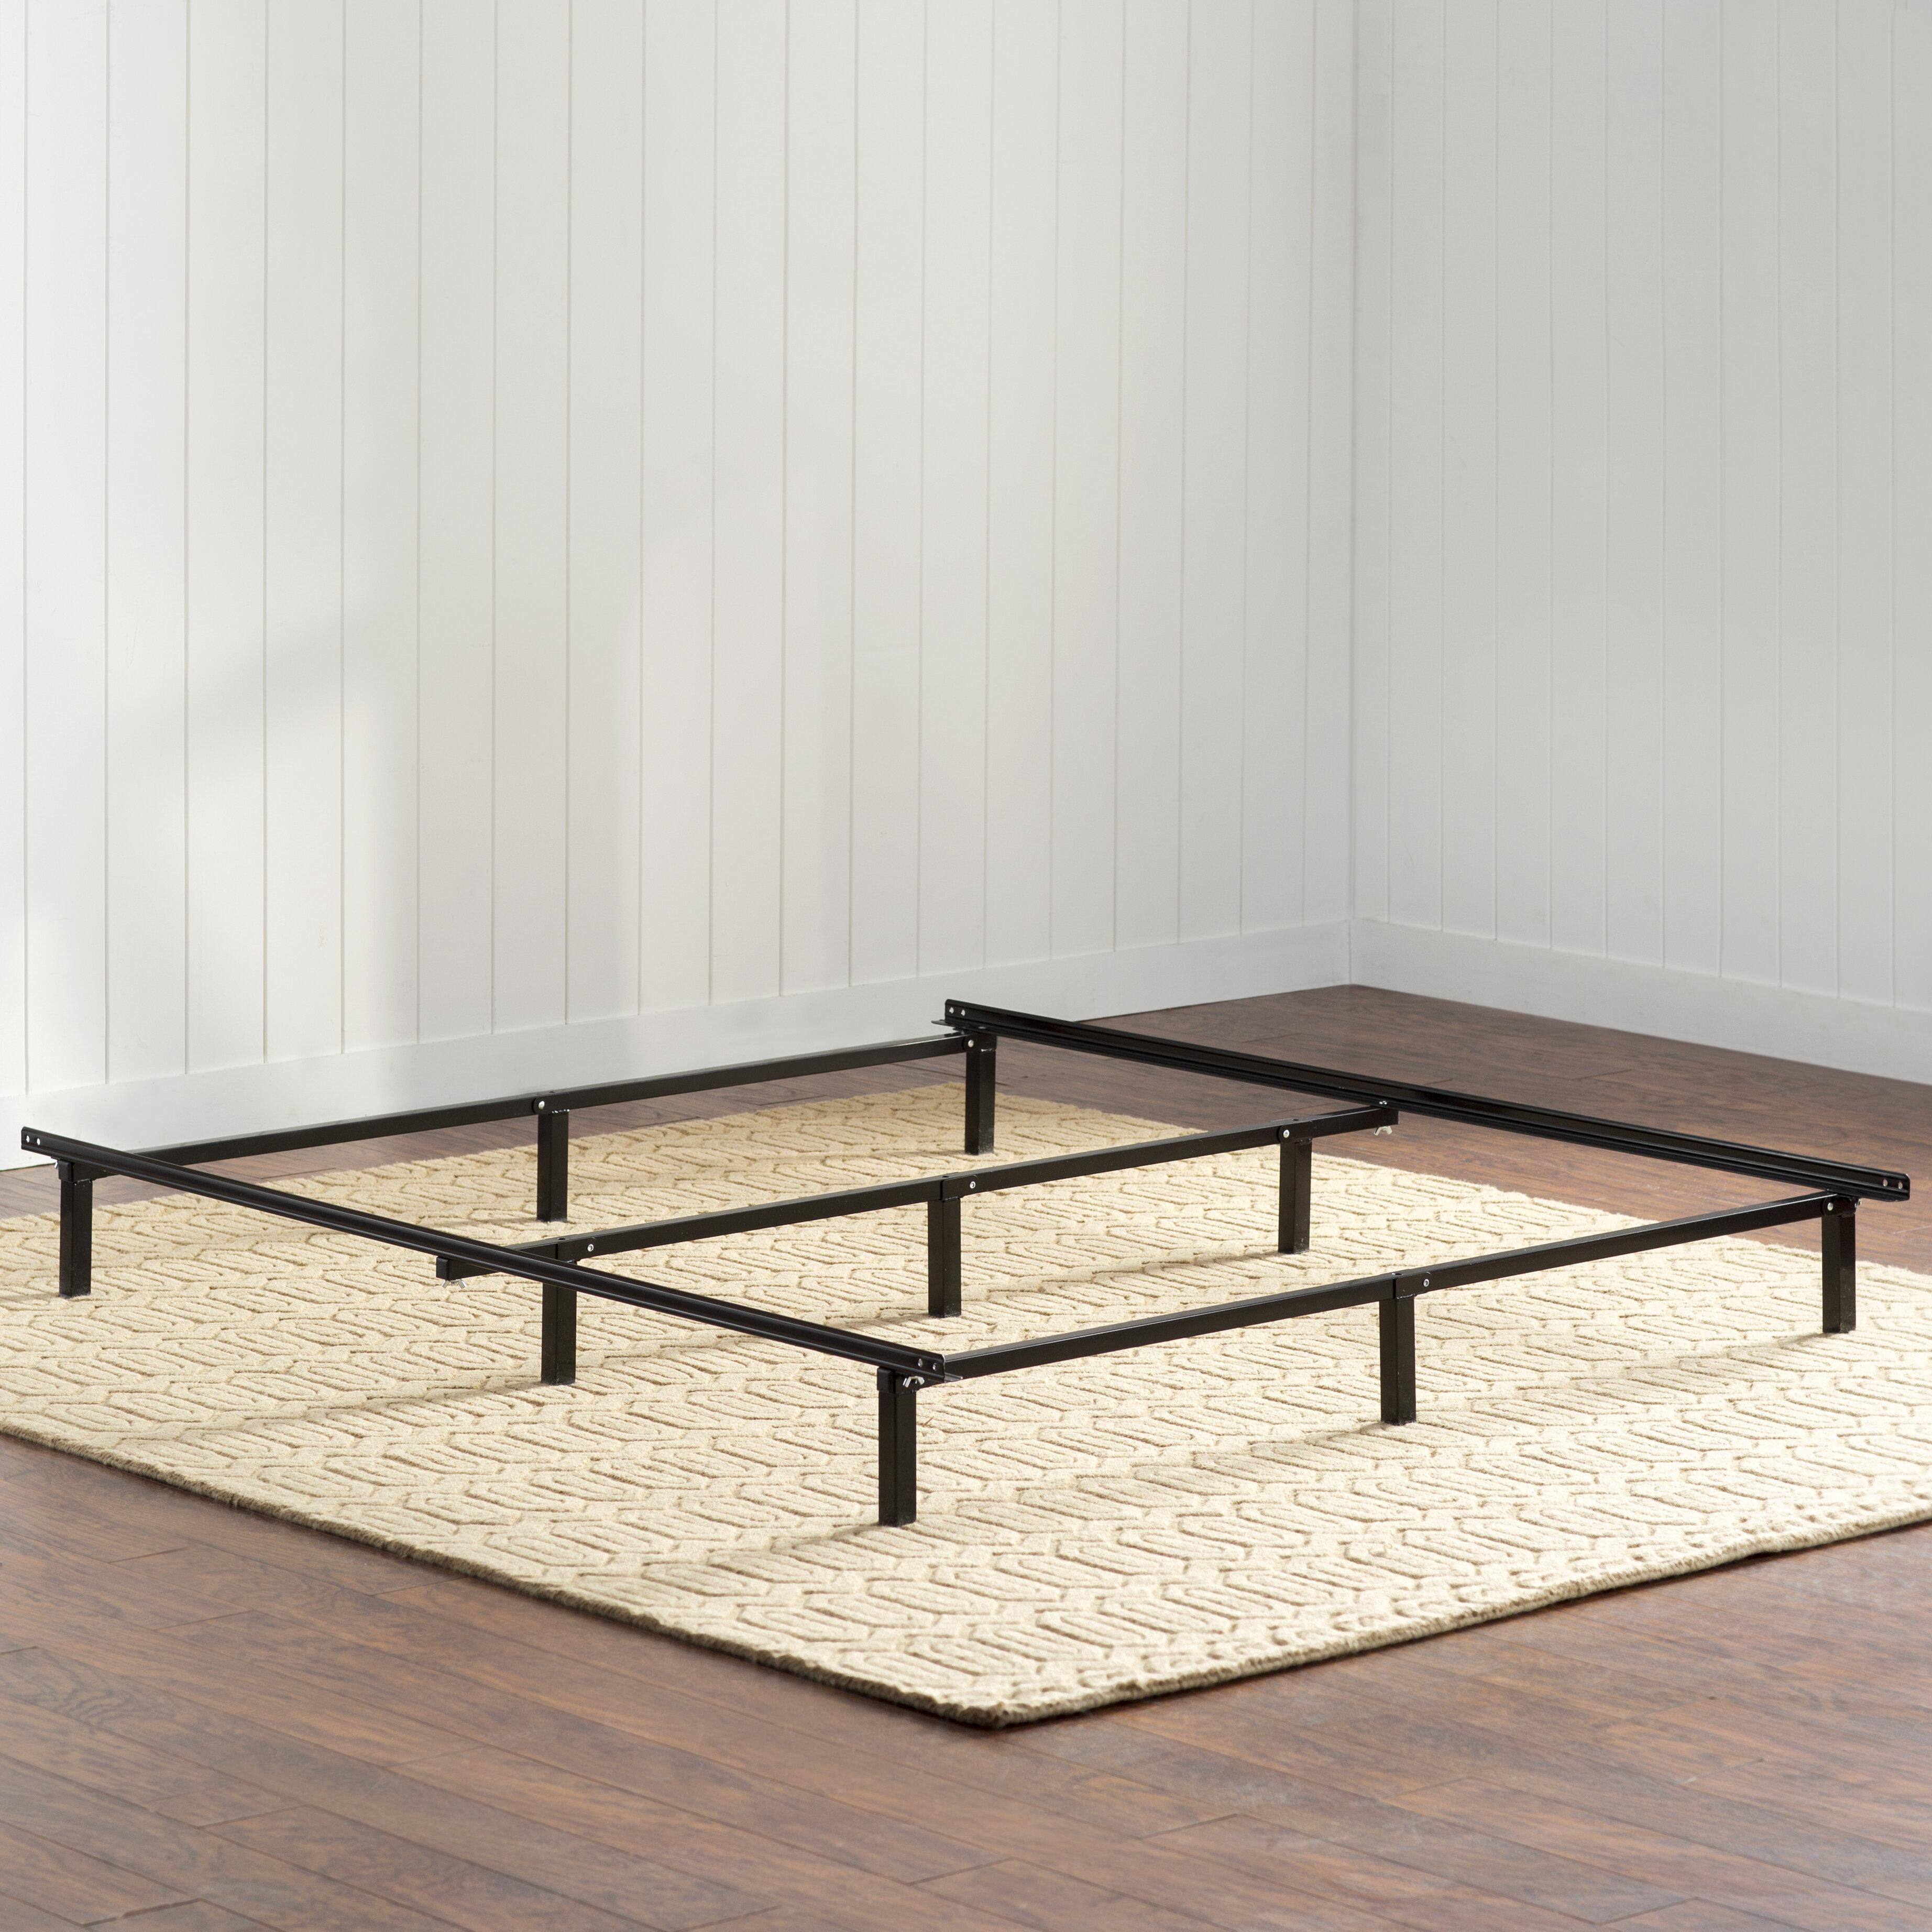 Wayfair BasicsTM Basics Metal Bed Frame Reviews